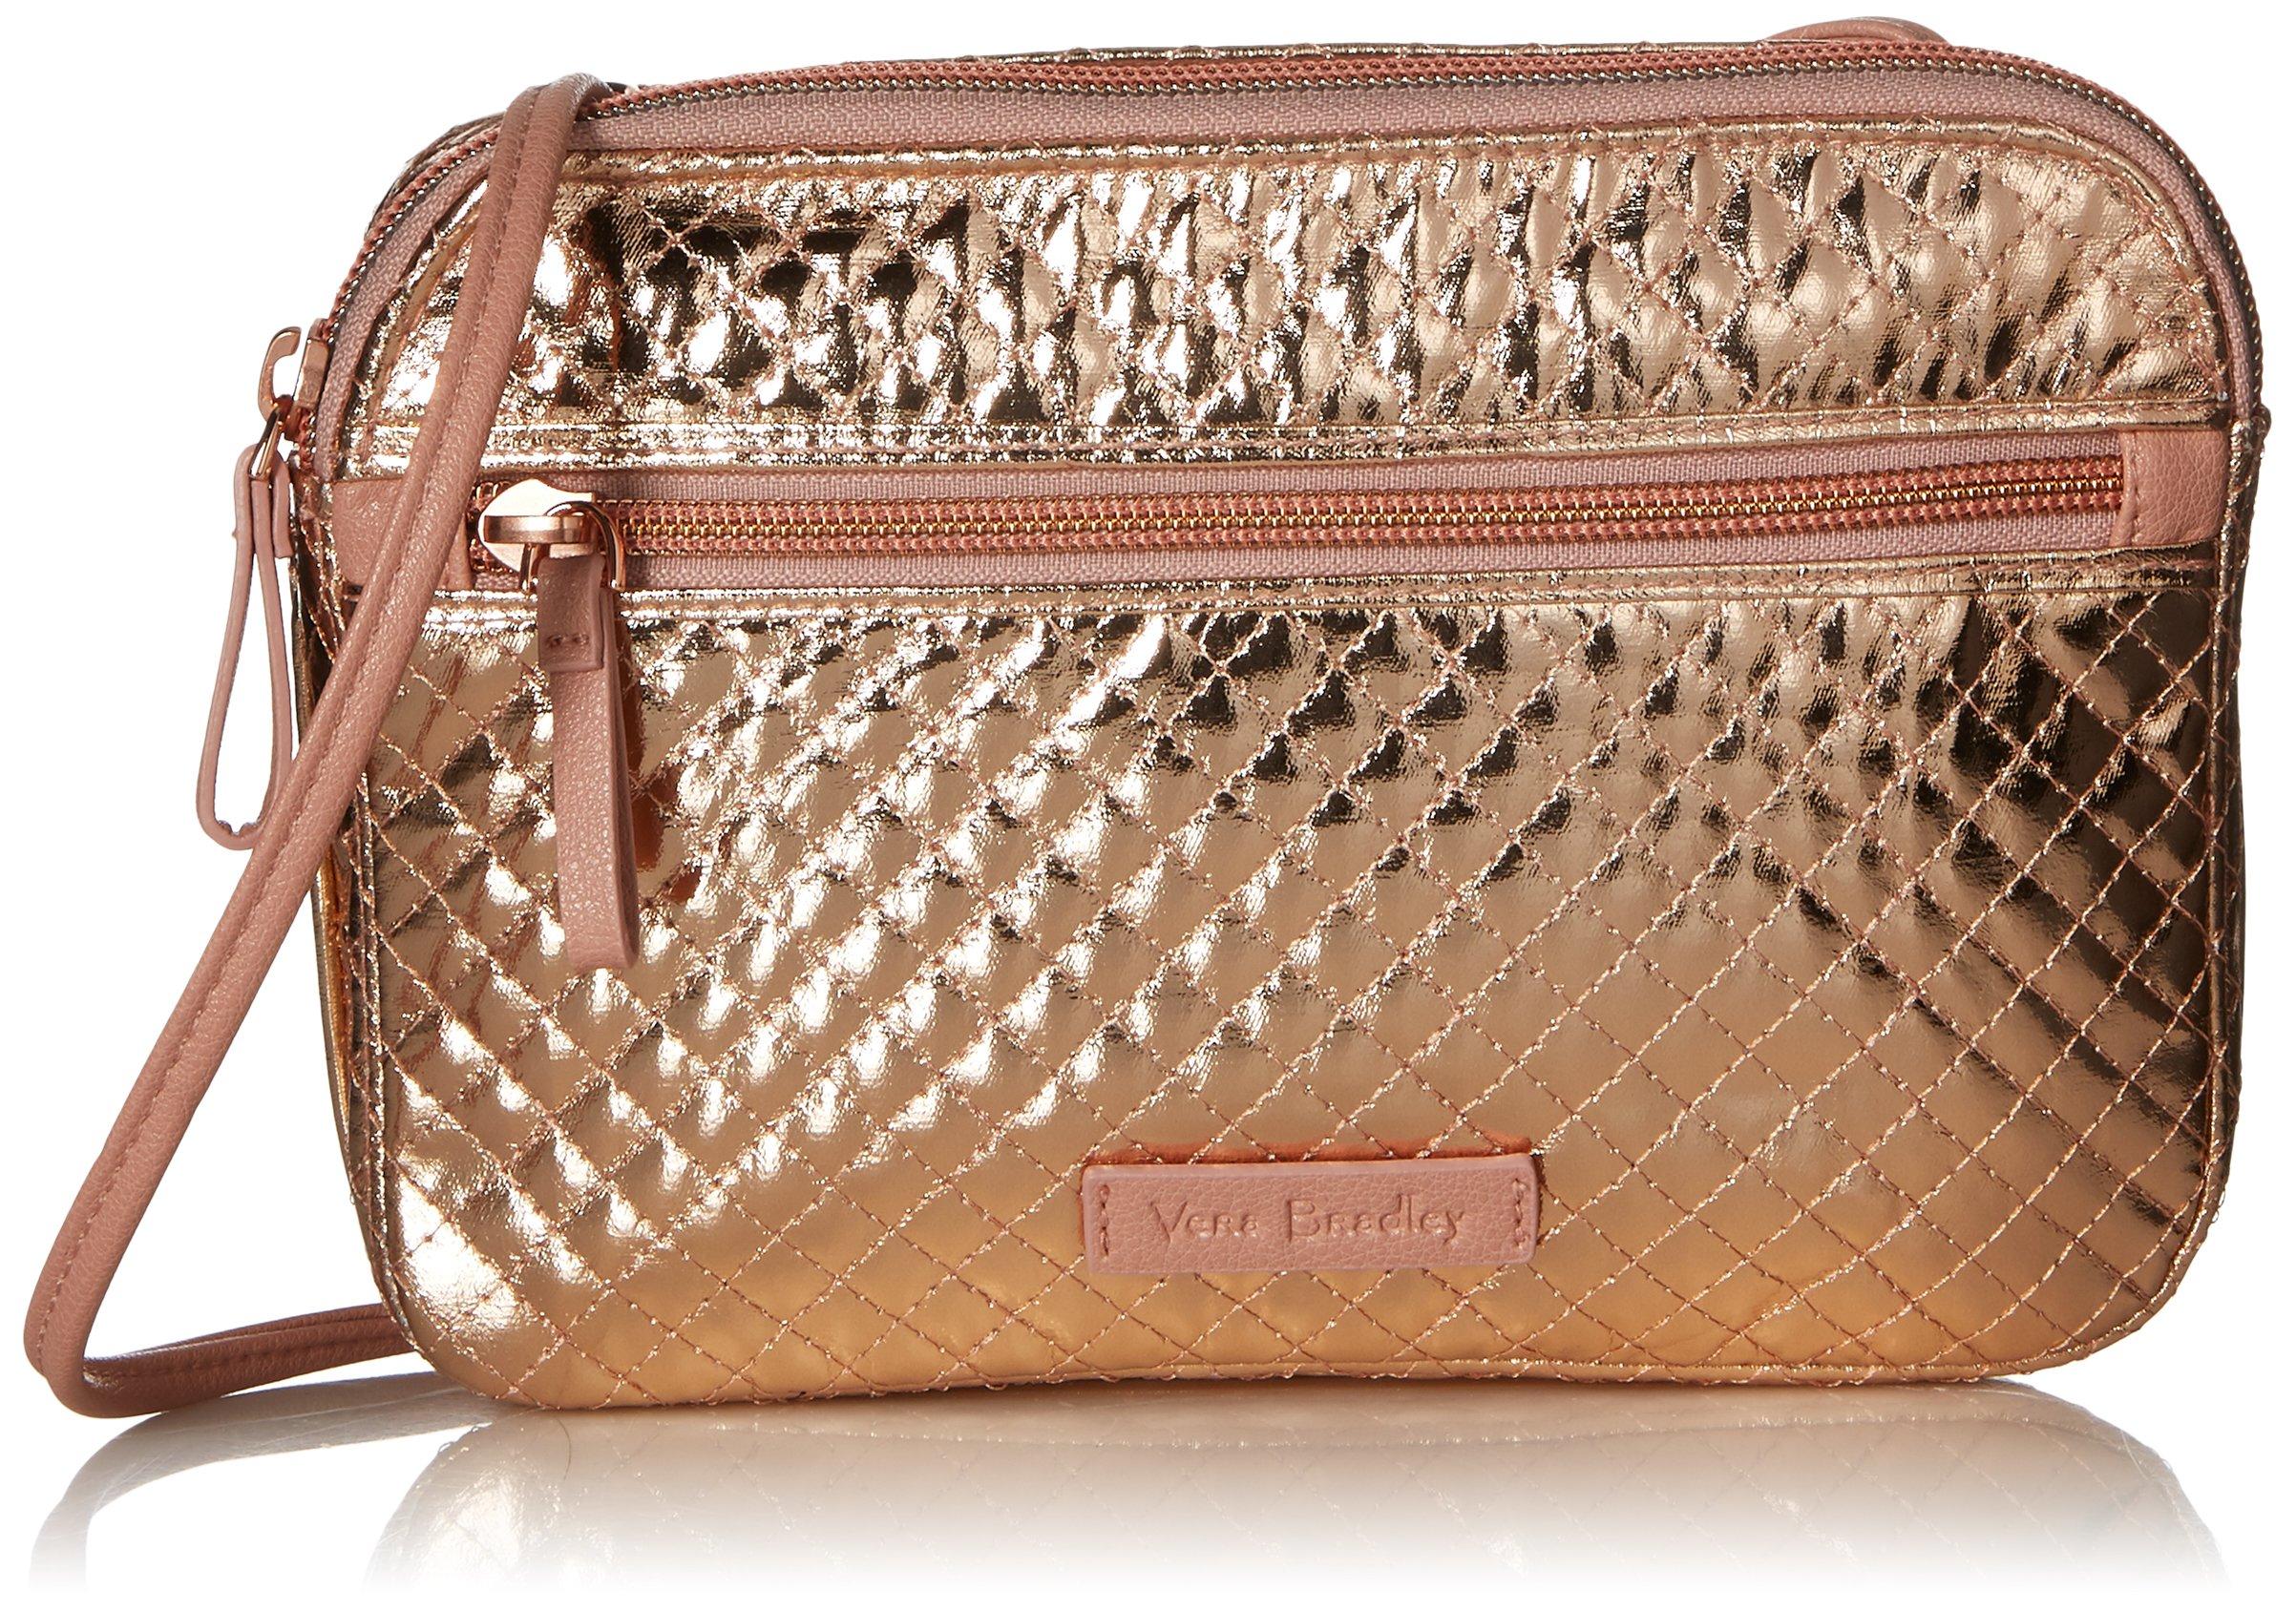 Vera Bradley Iconic Rfid Little Crossbody, Foiled Cotton, Rose Gold Shimmer